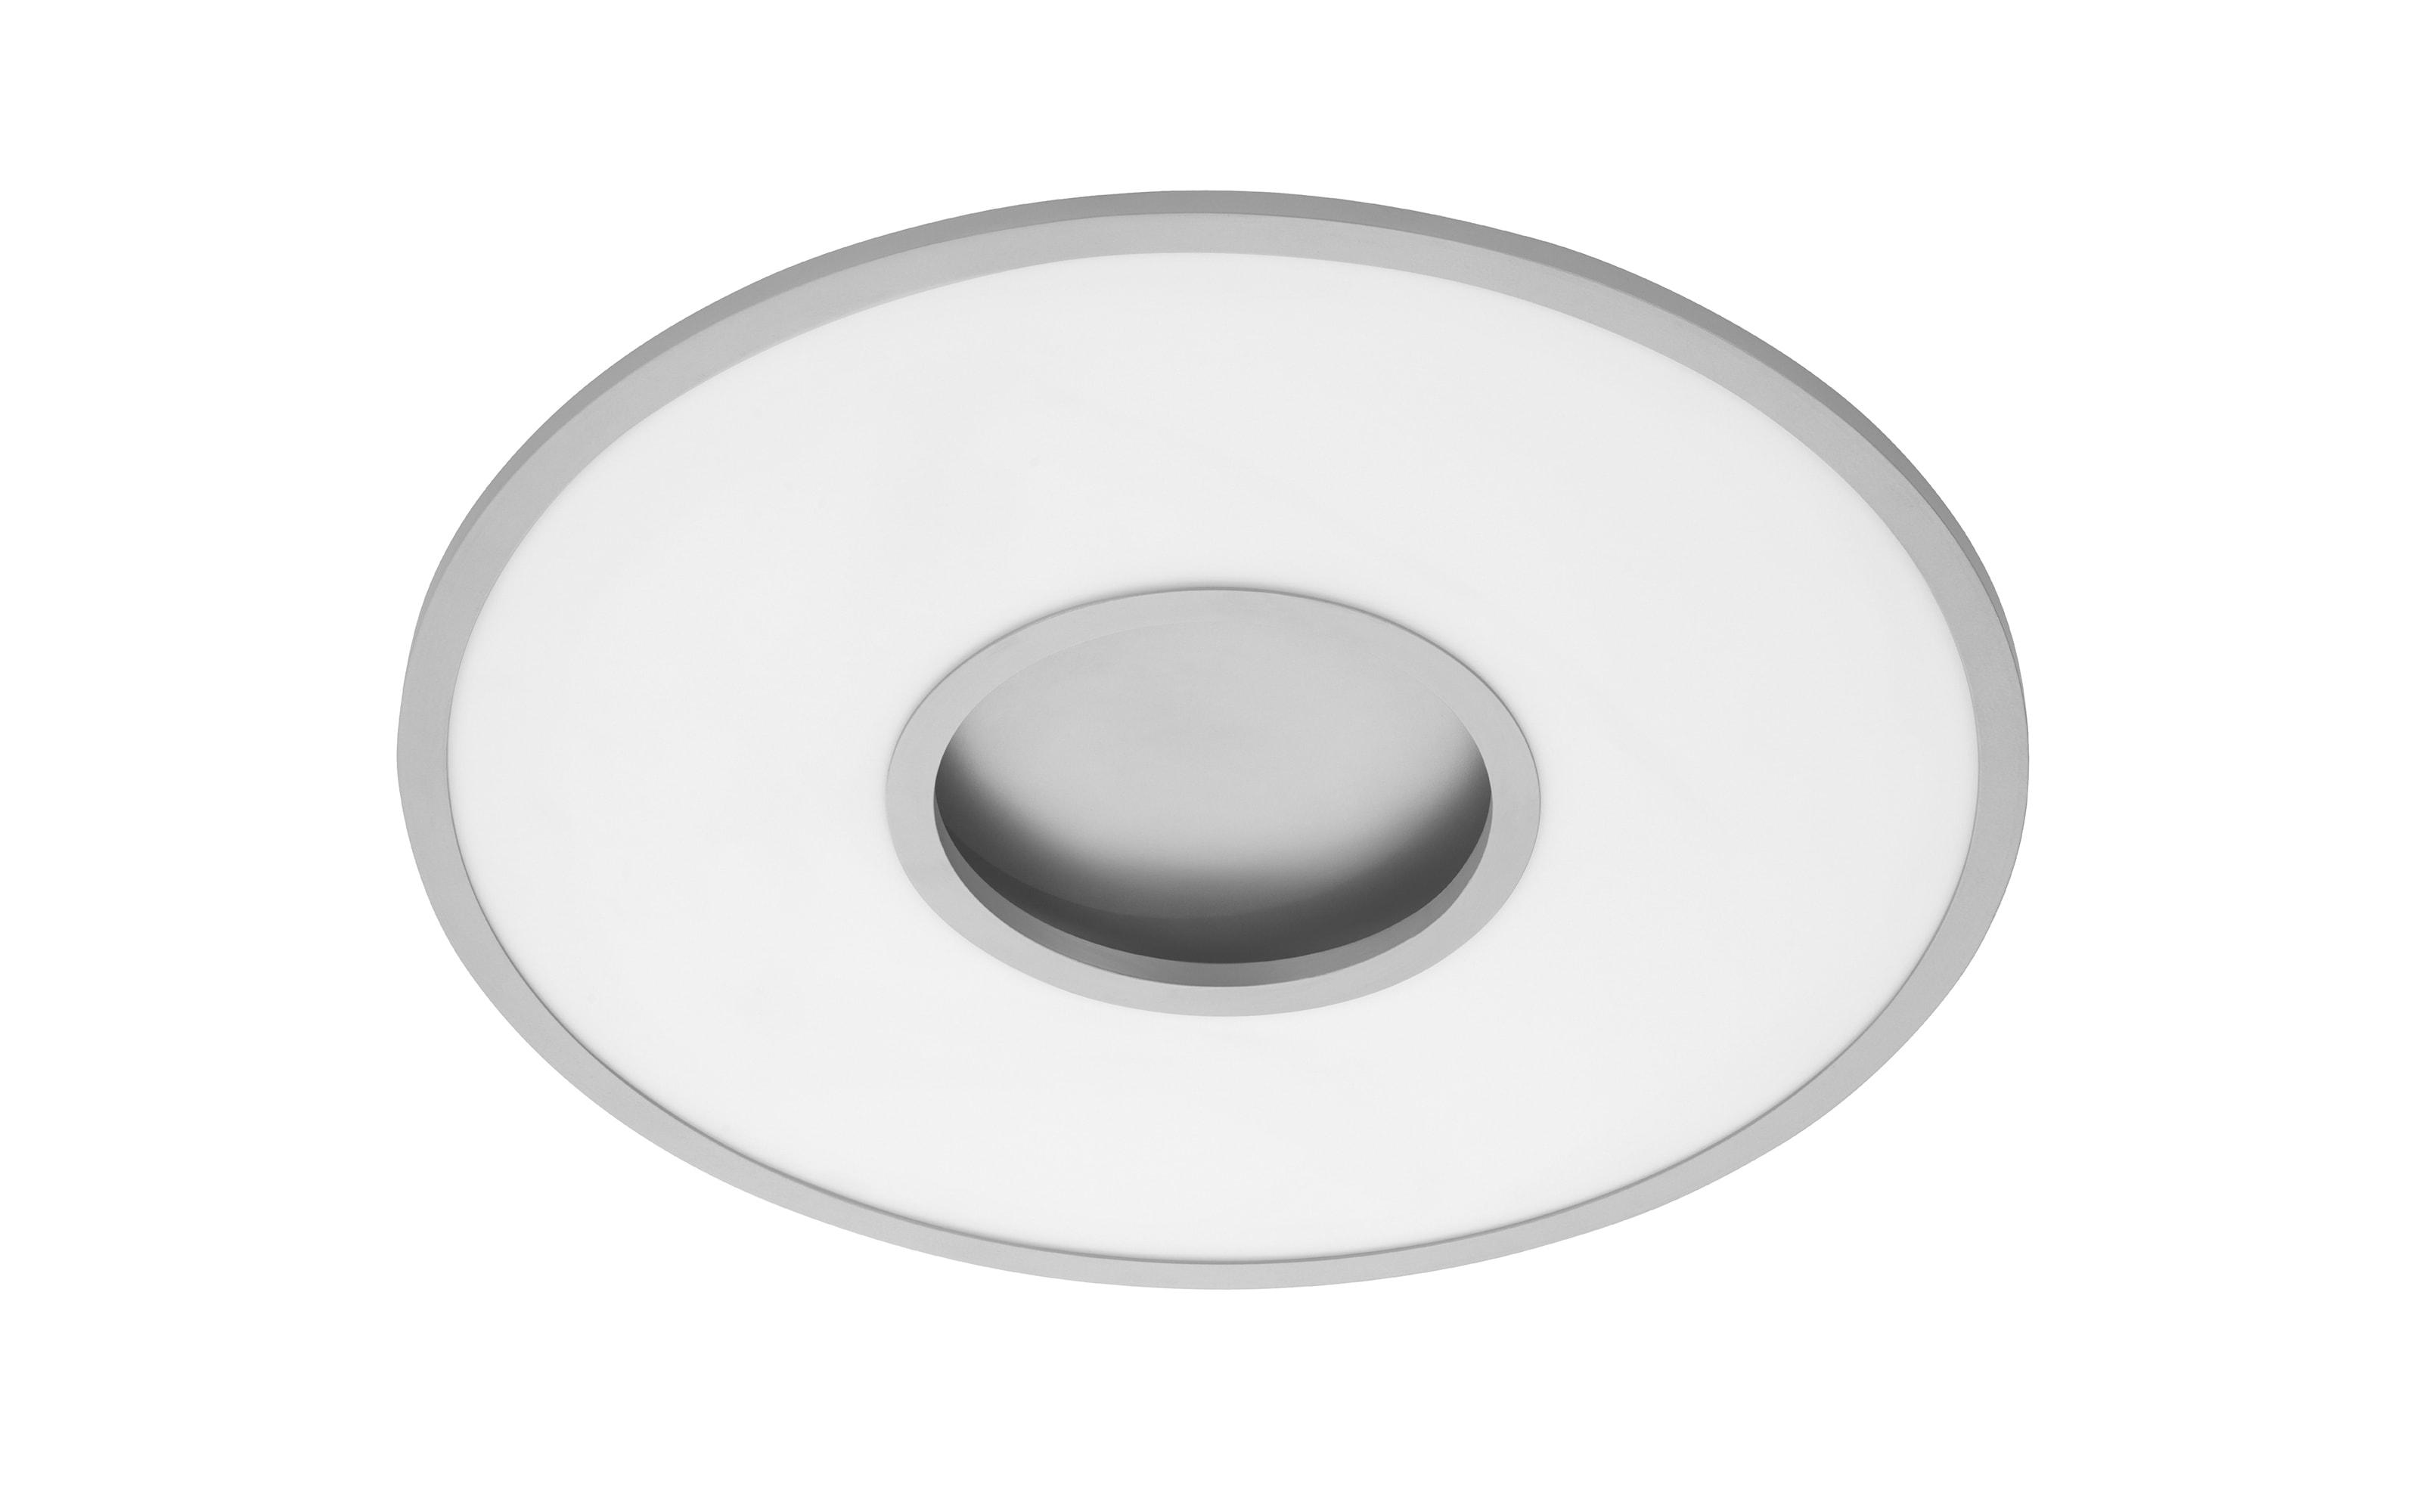 LED-Deckenleuchte Deco in chromfarbig matt, 60 cm